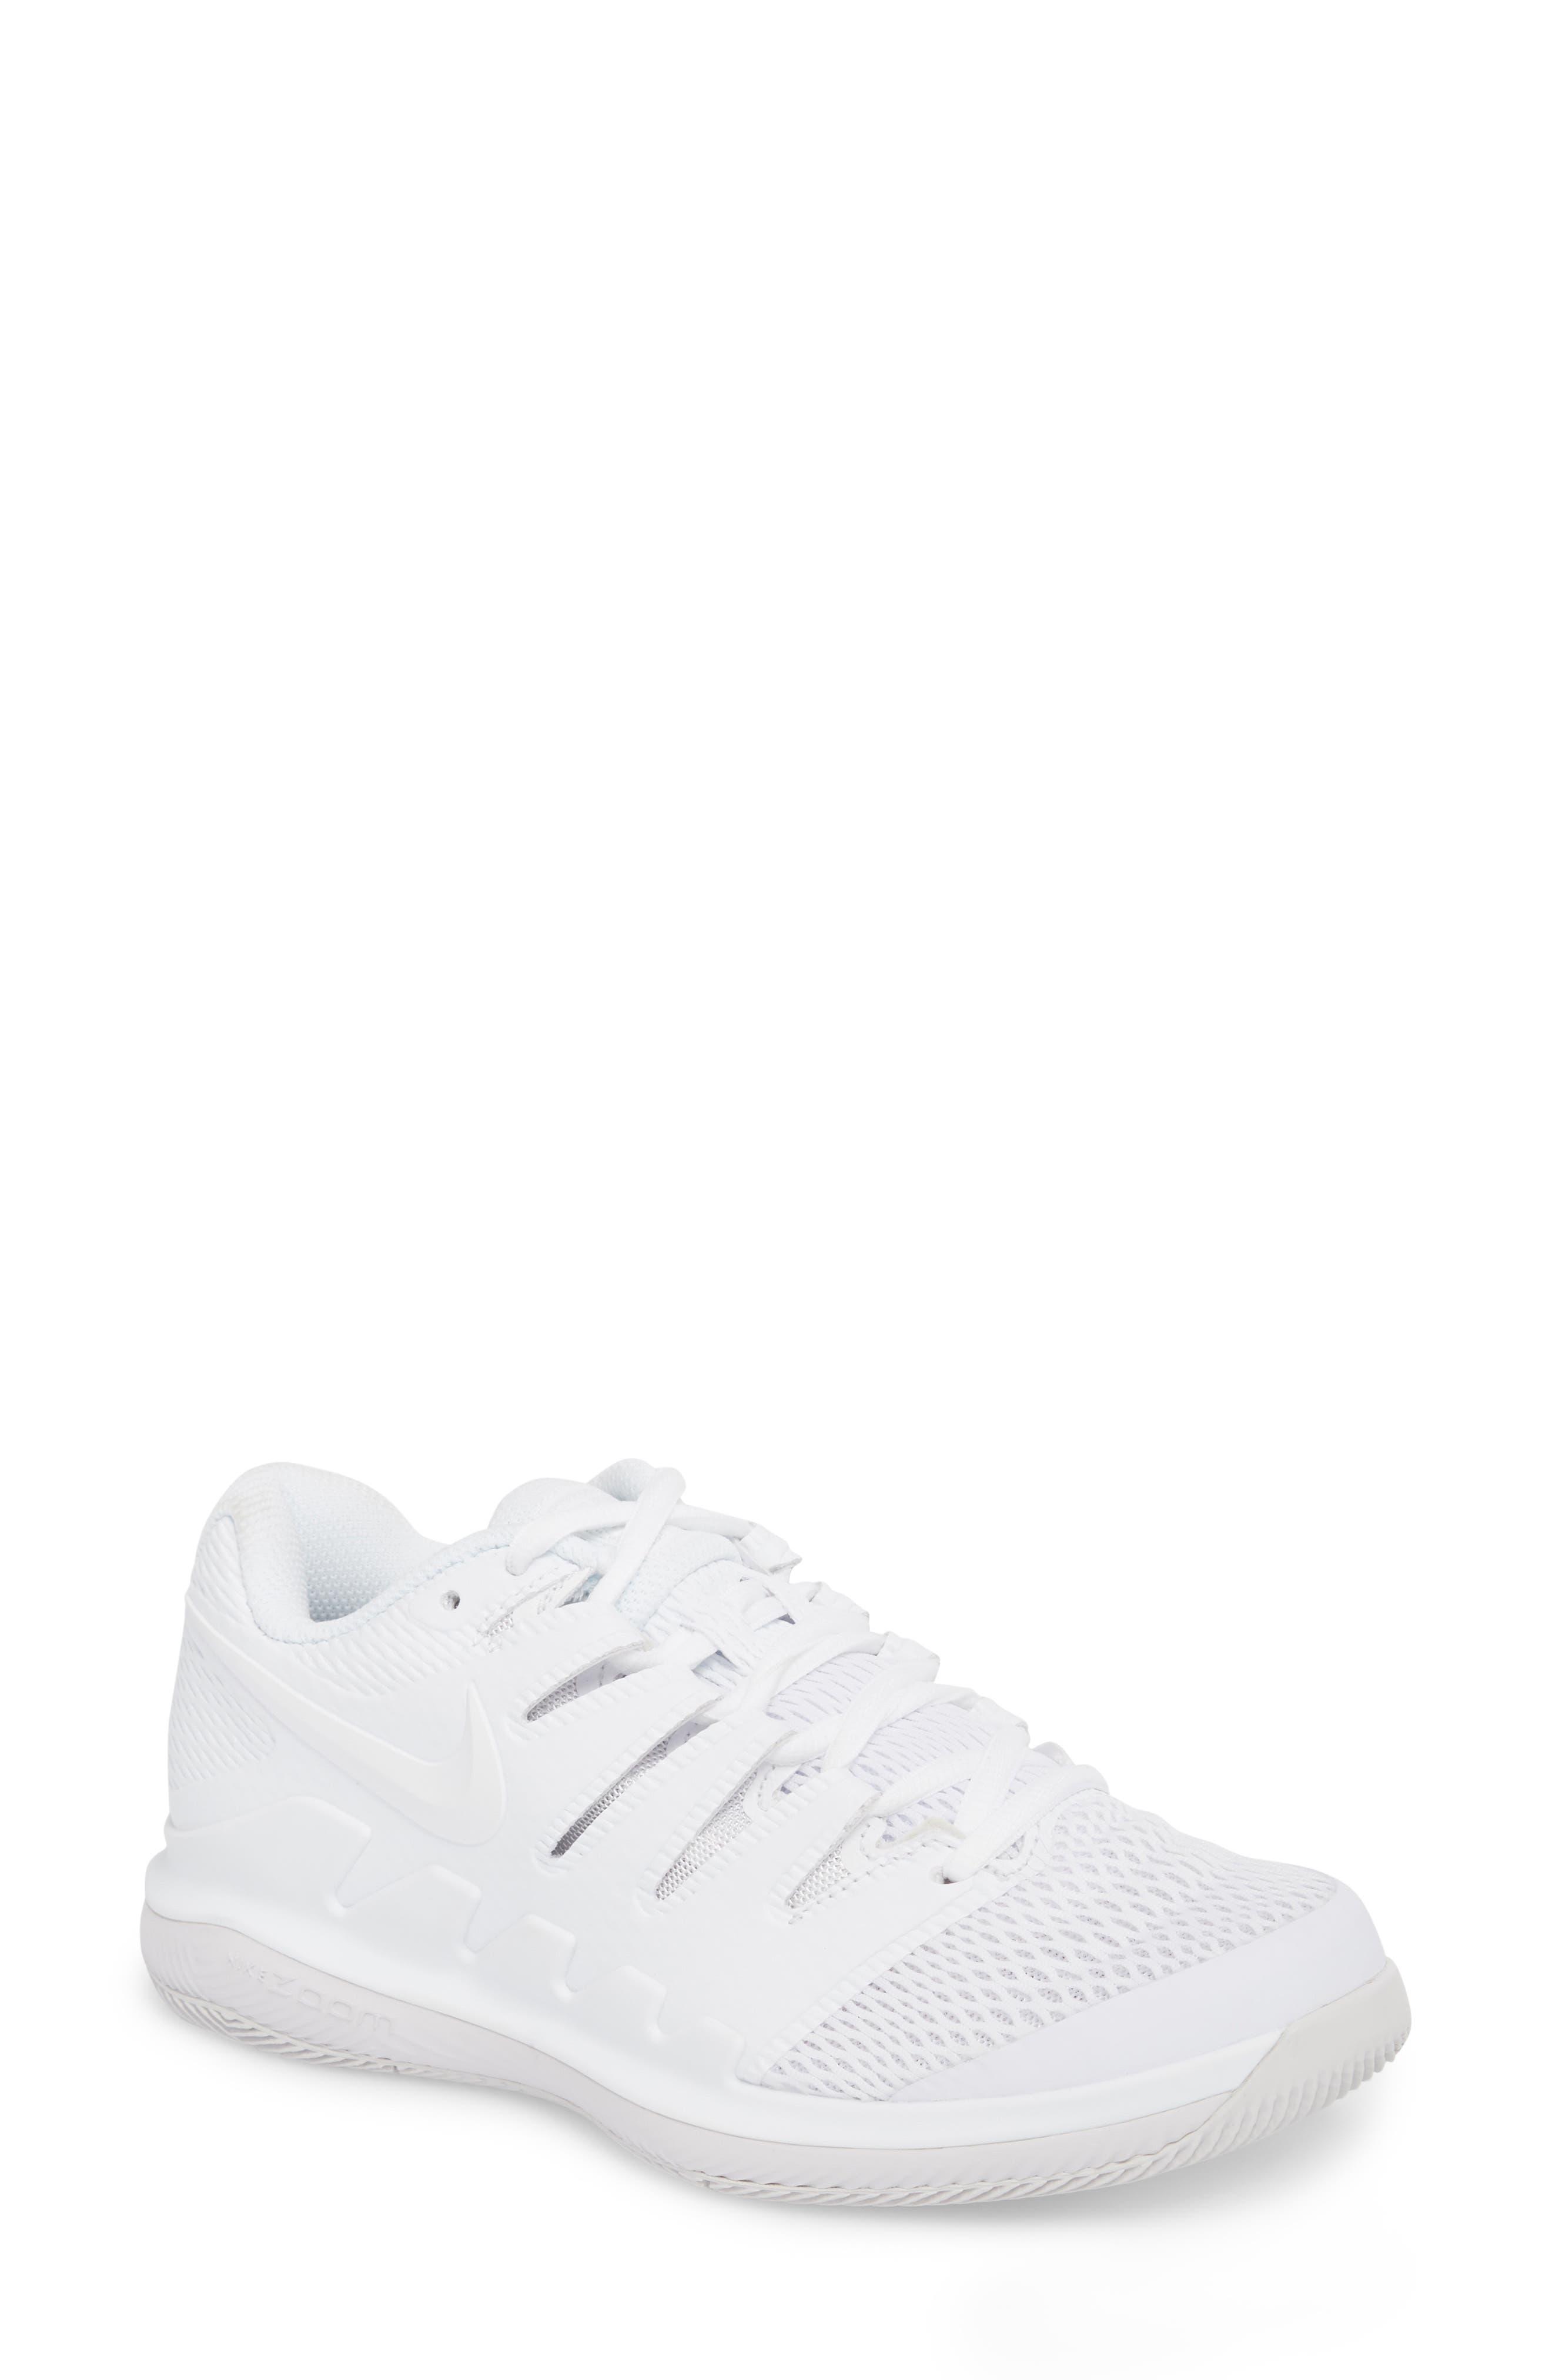 Air Zoom Vapor X Tennis Shoe,                         Main,                         color, WHITE/ WHITE/ VAST GREY